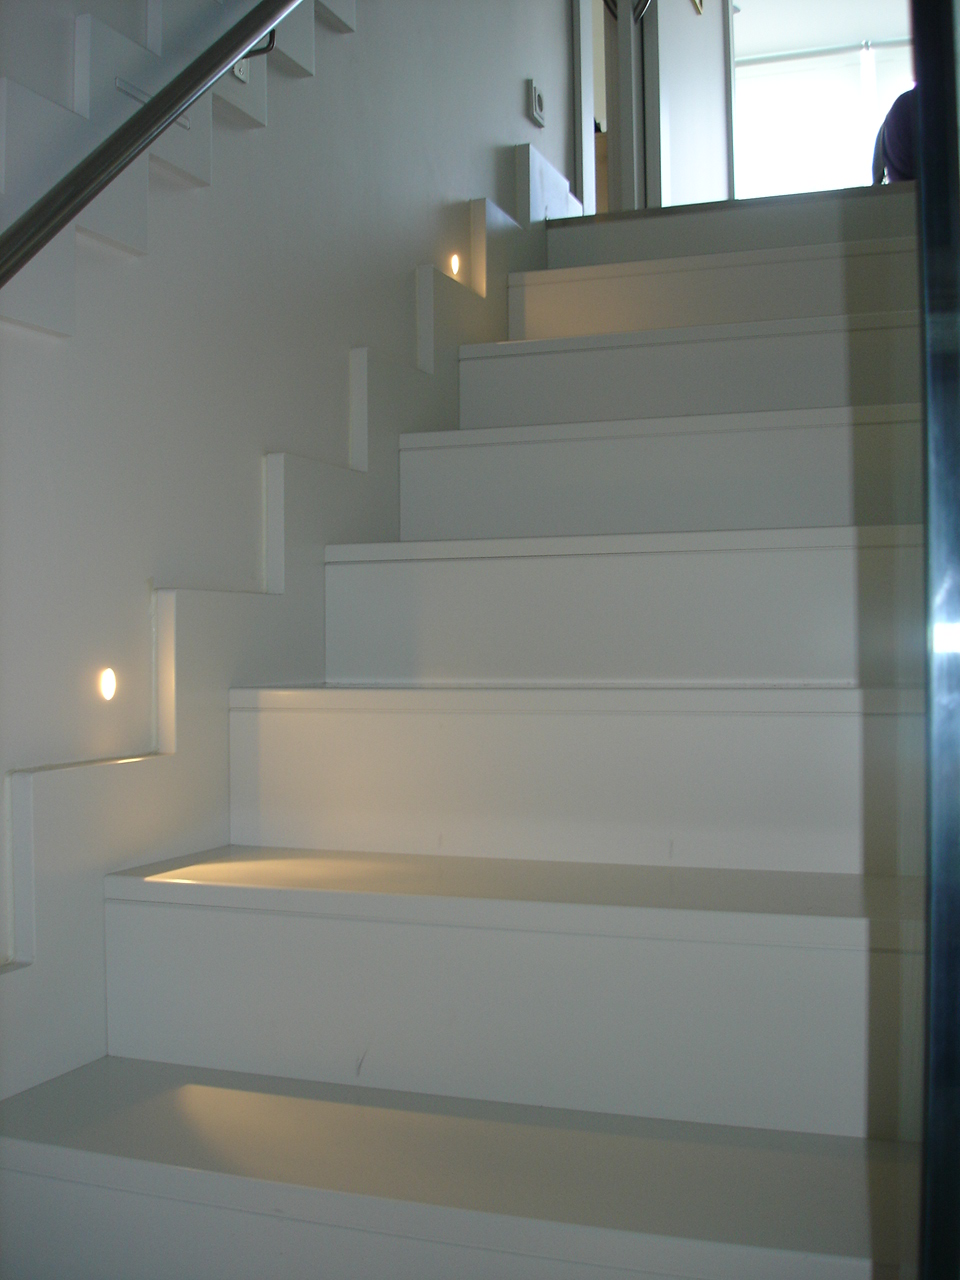 Decora con ana 1 02 11 1 03 11 for Escaleras con luz